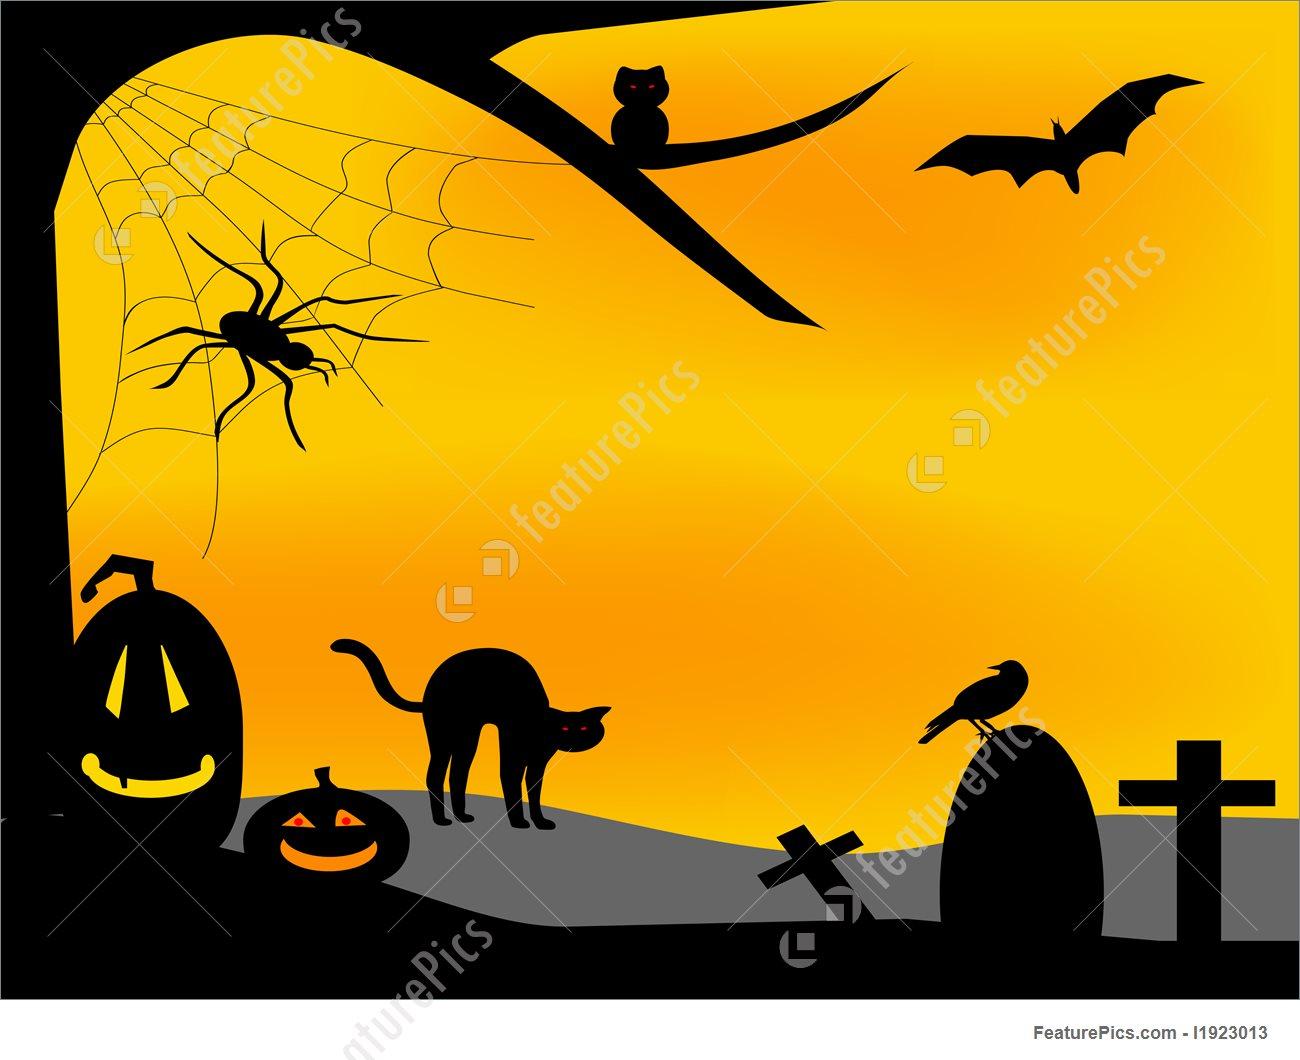 Halloween Halloween Background   Stock Illustration I1923013 at 1300x1060